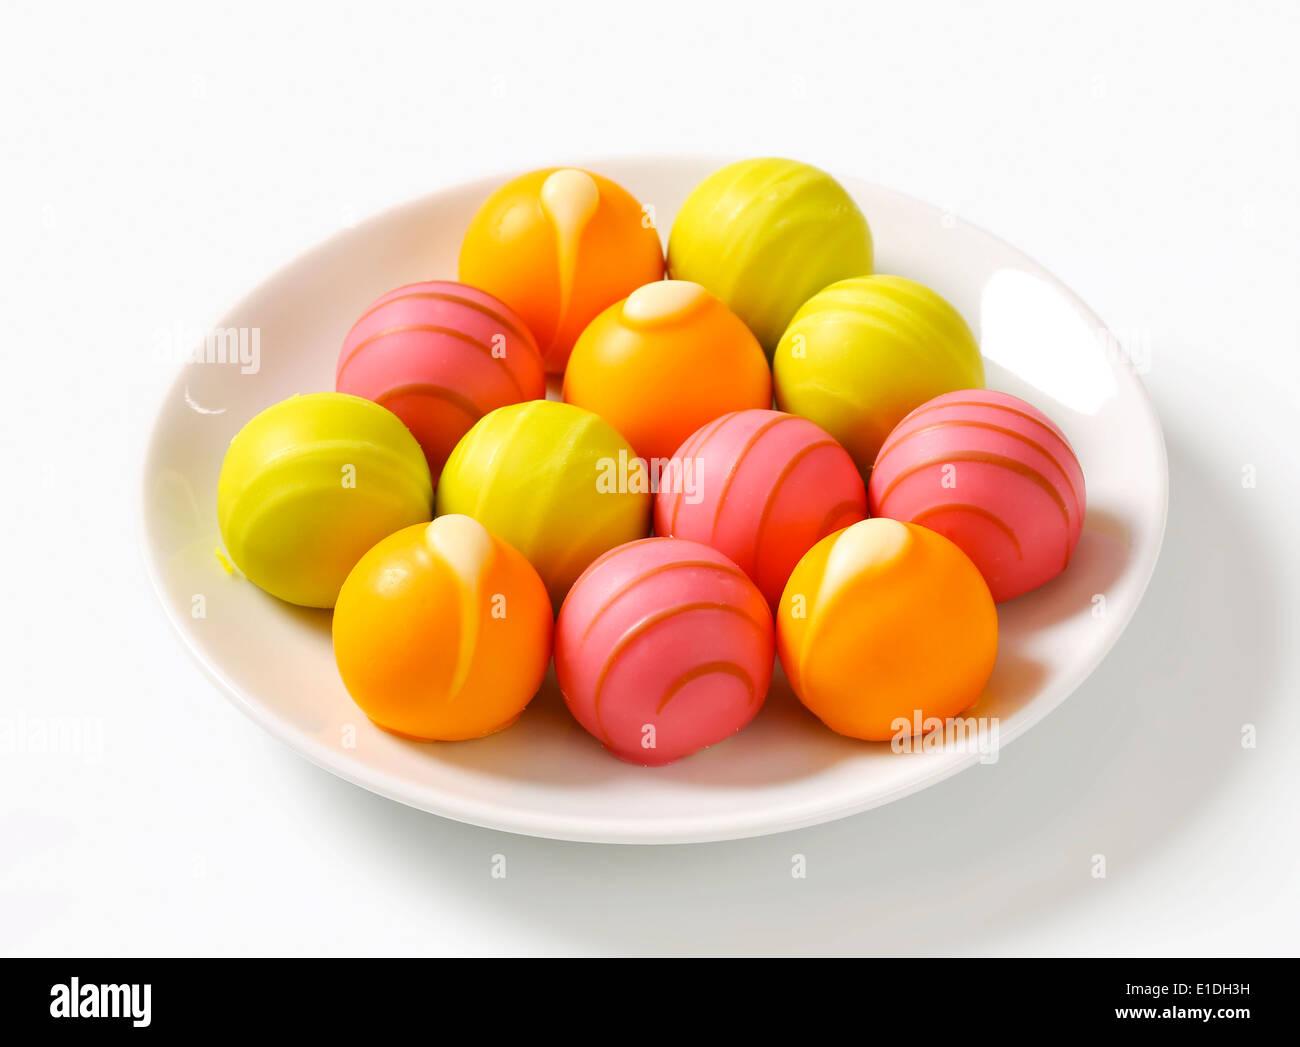 White chocolate bonbons with fruit ganache filling - Stock Image